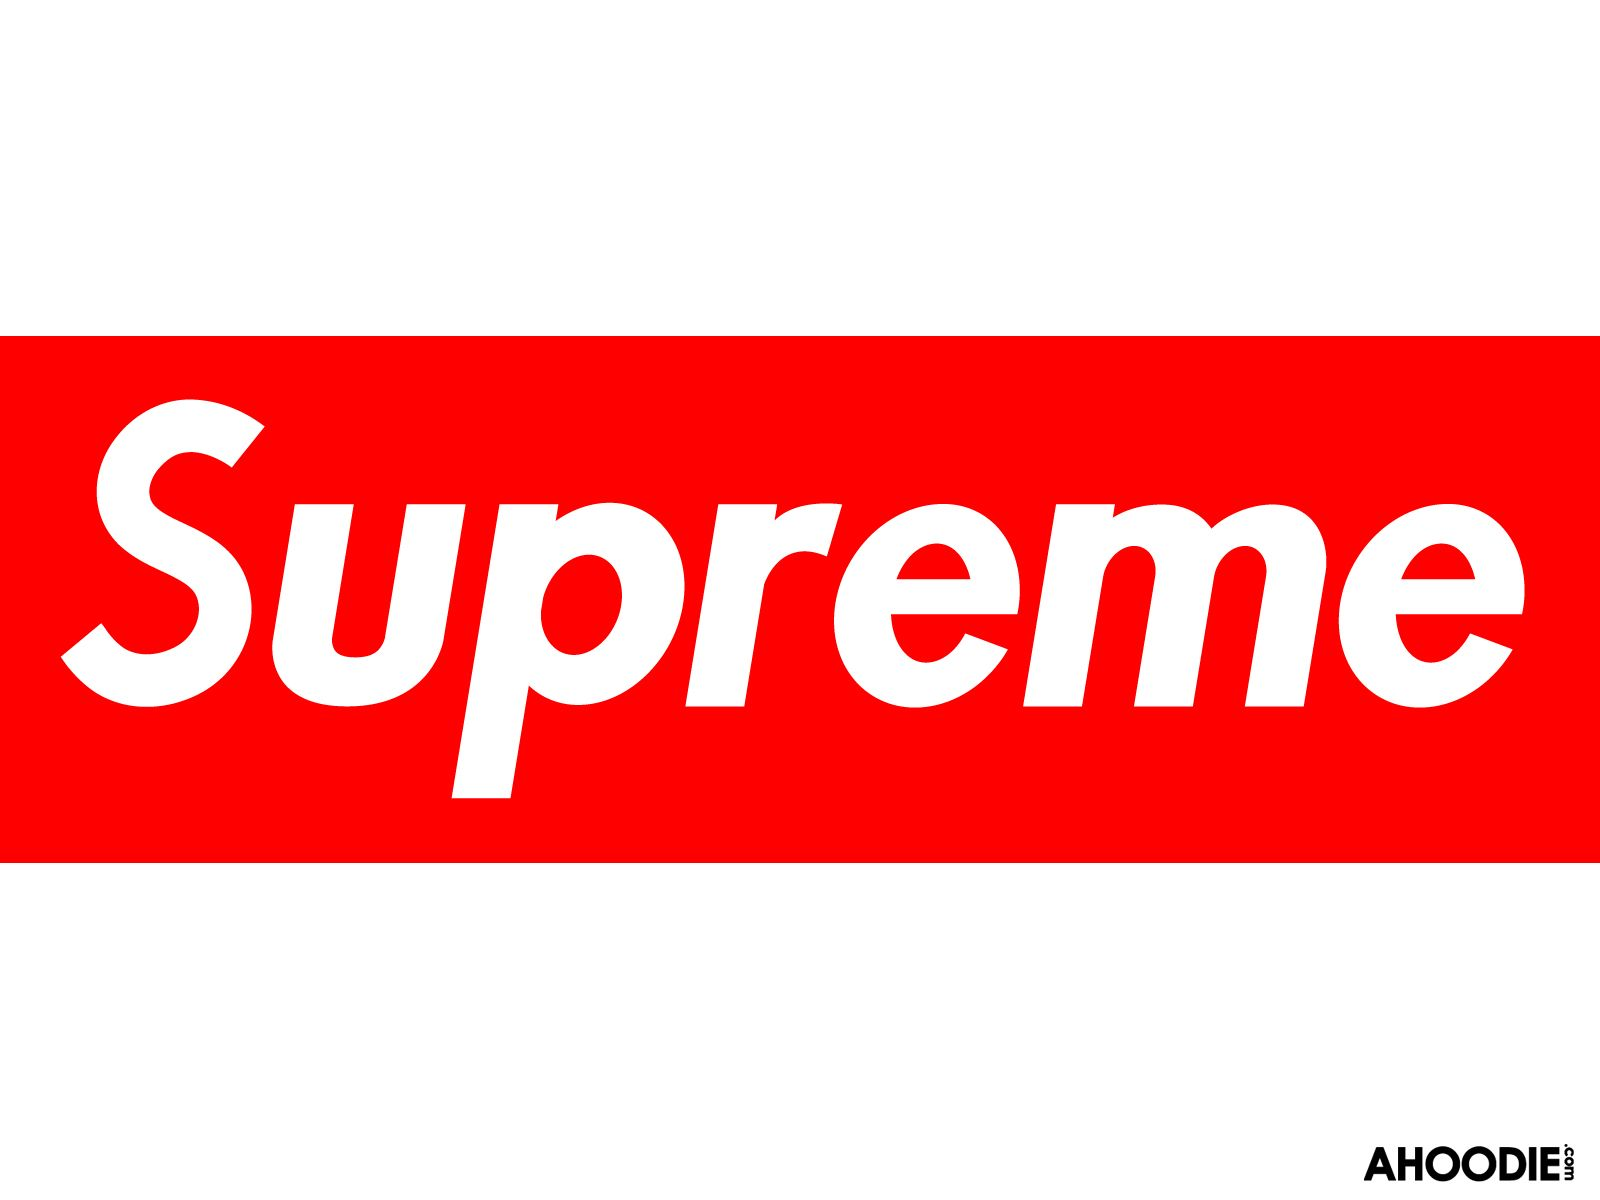 Ofwgkta Wallpaper Hd Logos Logos Pinterest Supreme Logo Logos And Fonts